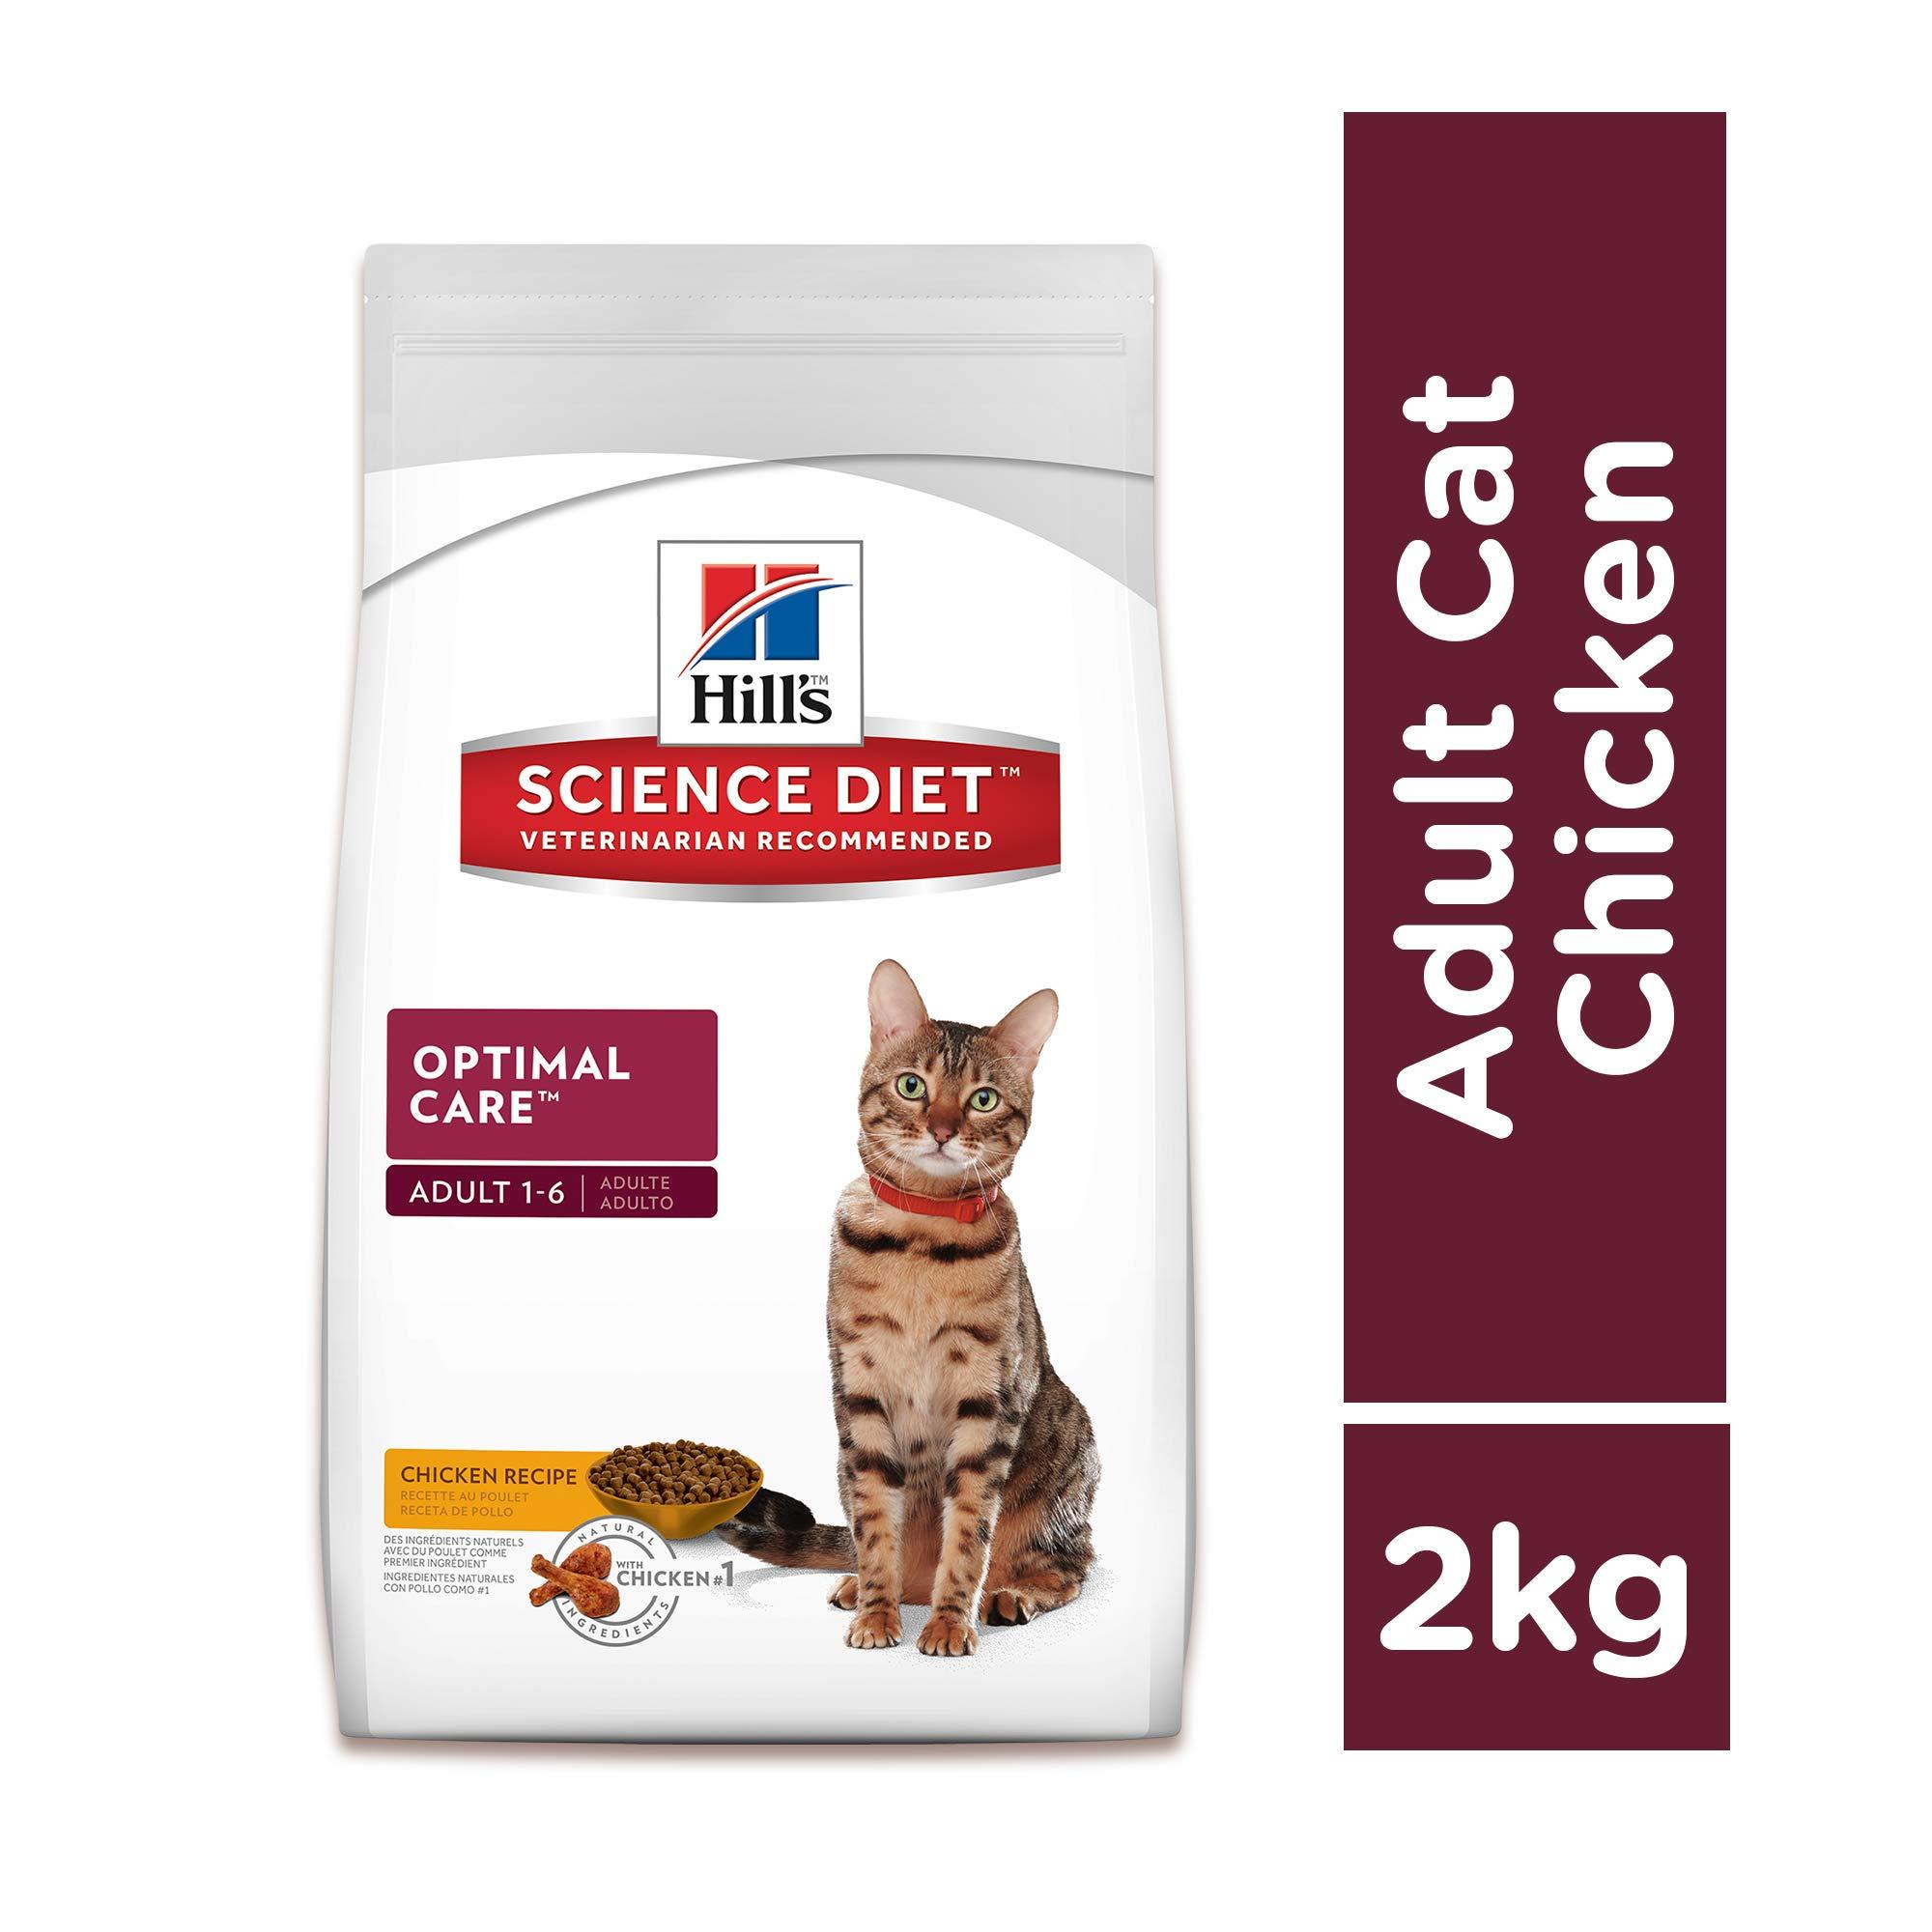 science diet optimal care cat food